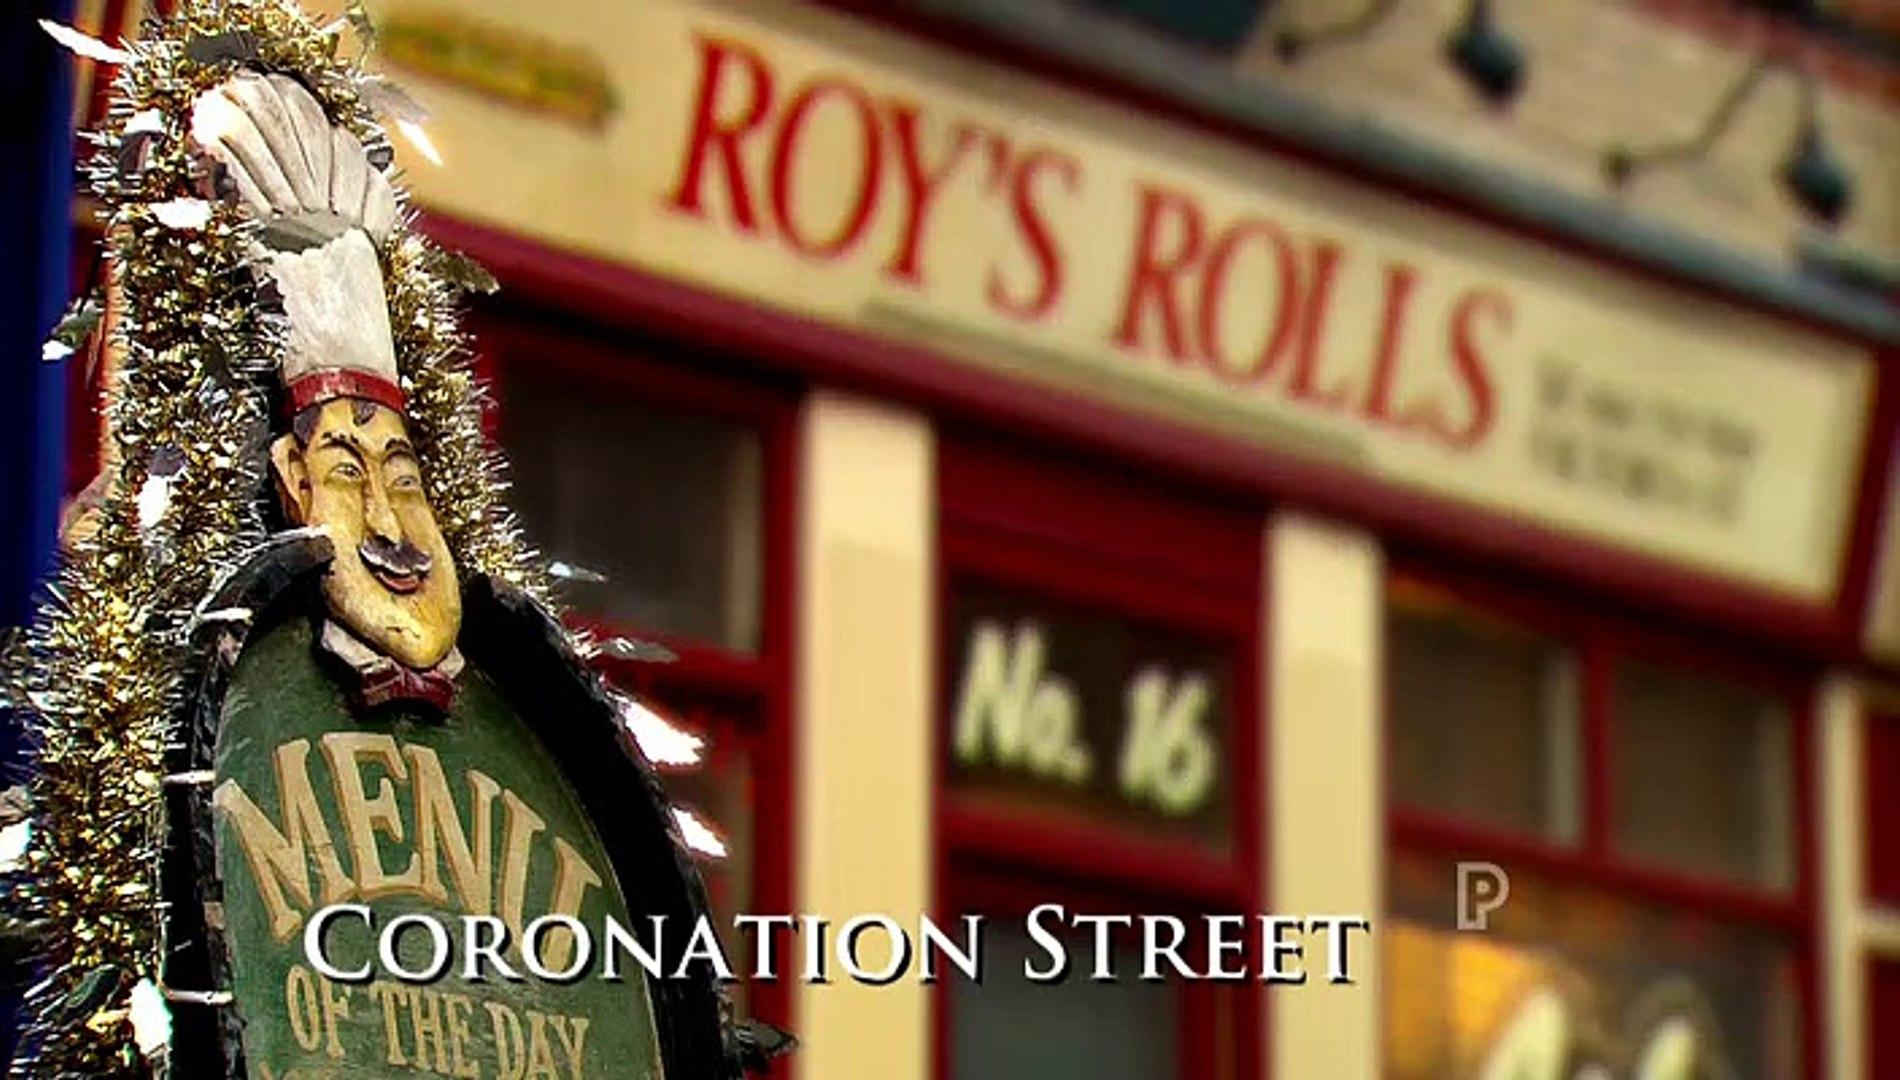 Coronation Street 14th December 2018 Part 2